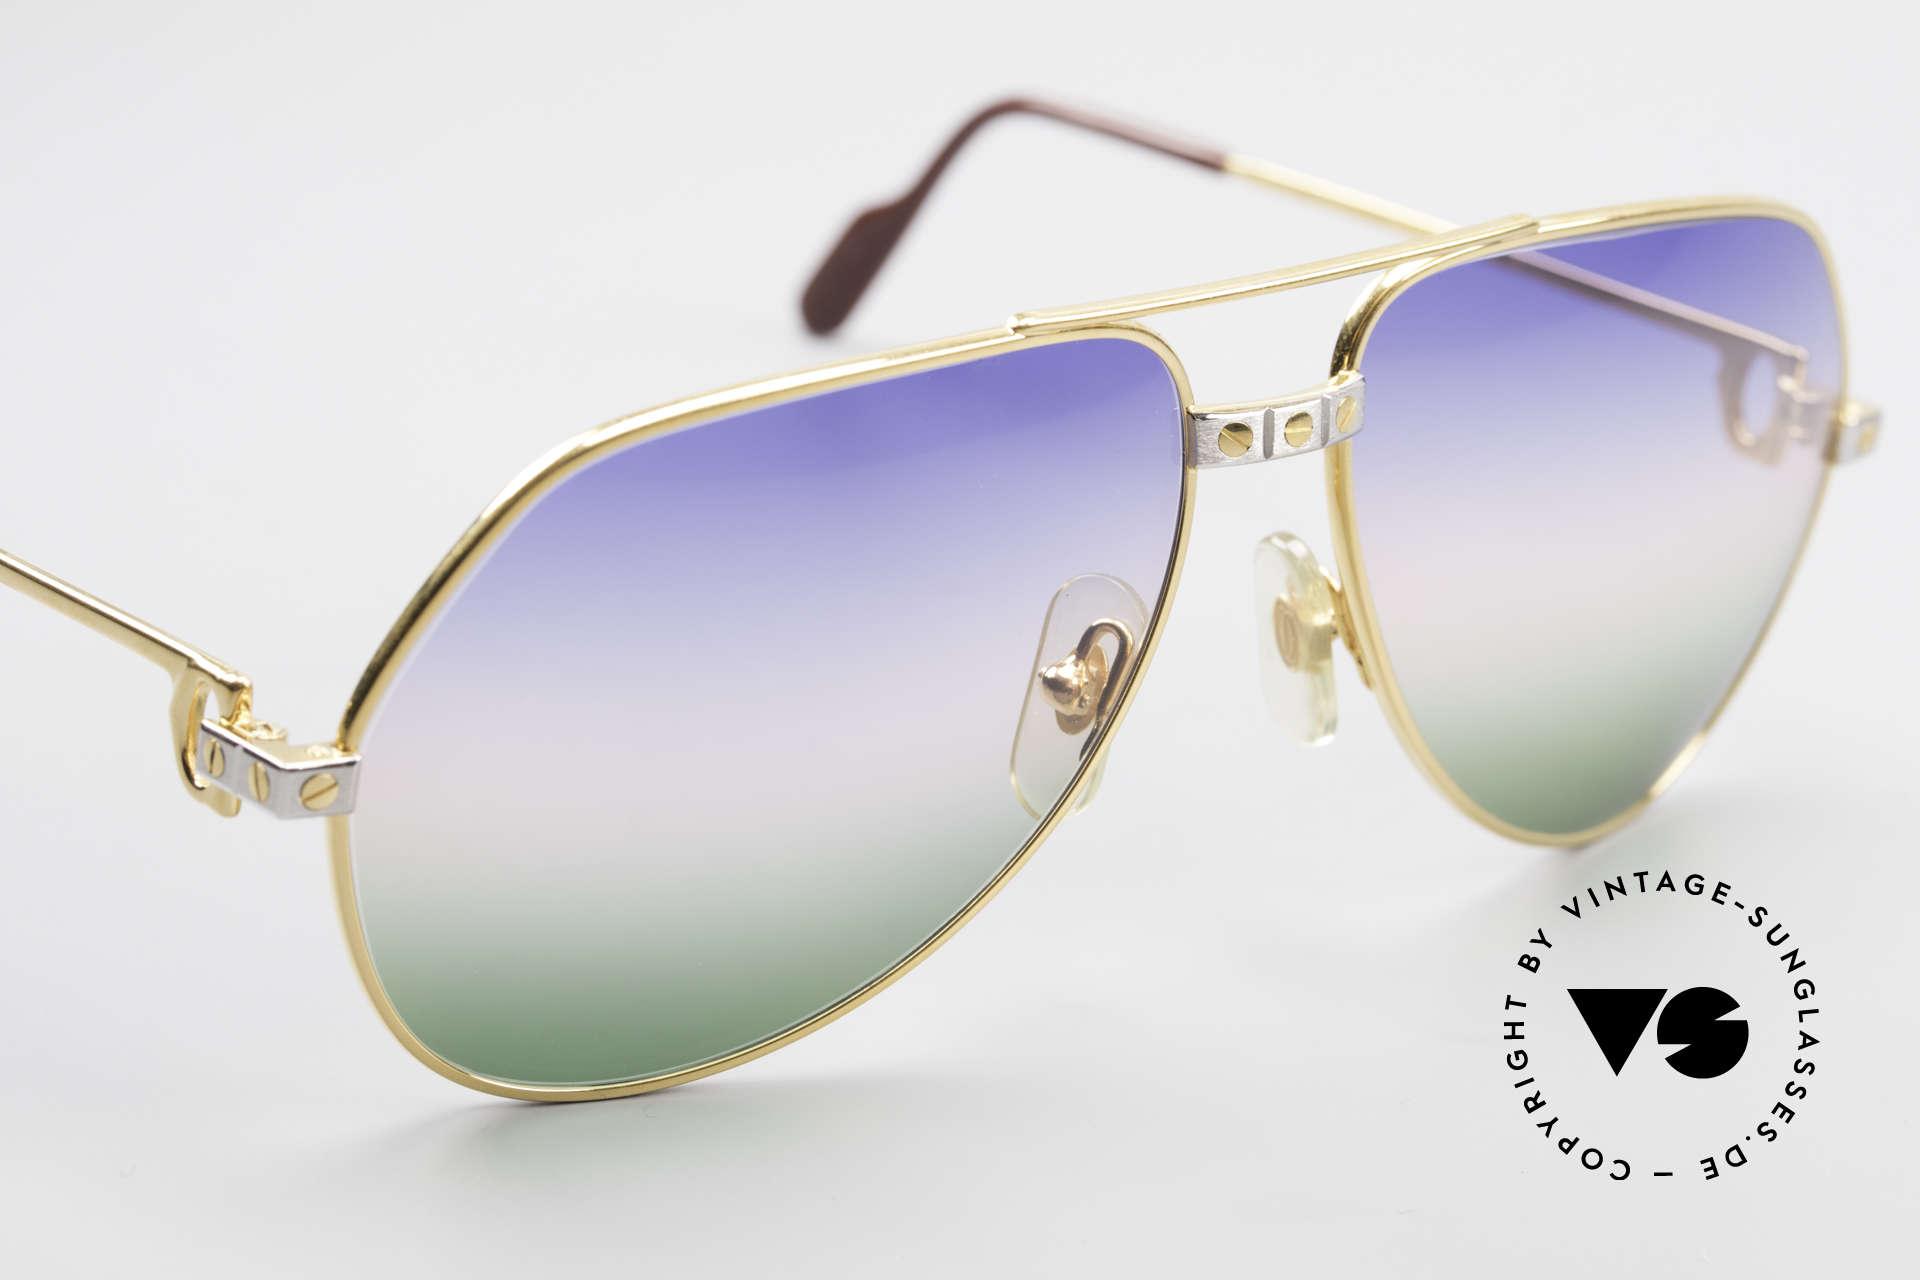 Cartier Vendome Santos - M Rare Luxury Aviator Shades, ultra rare, new TRICOLOR customized GRADIENT lenses, Made for Men and Women